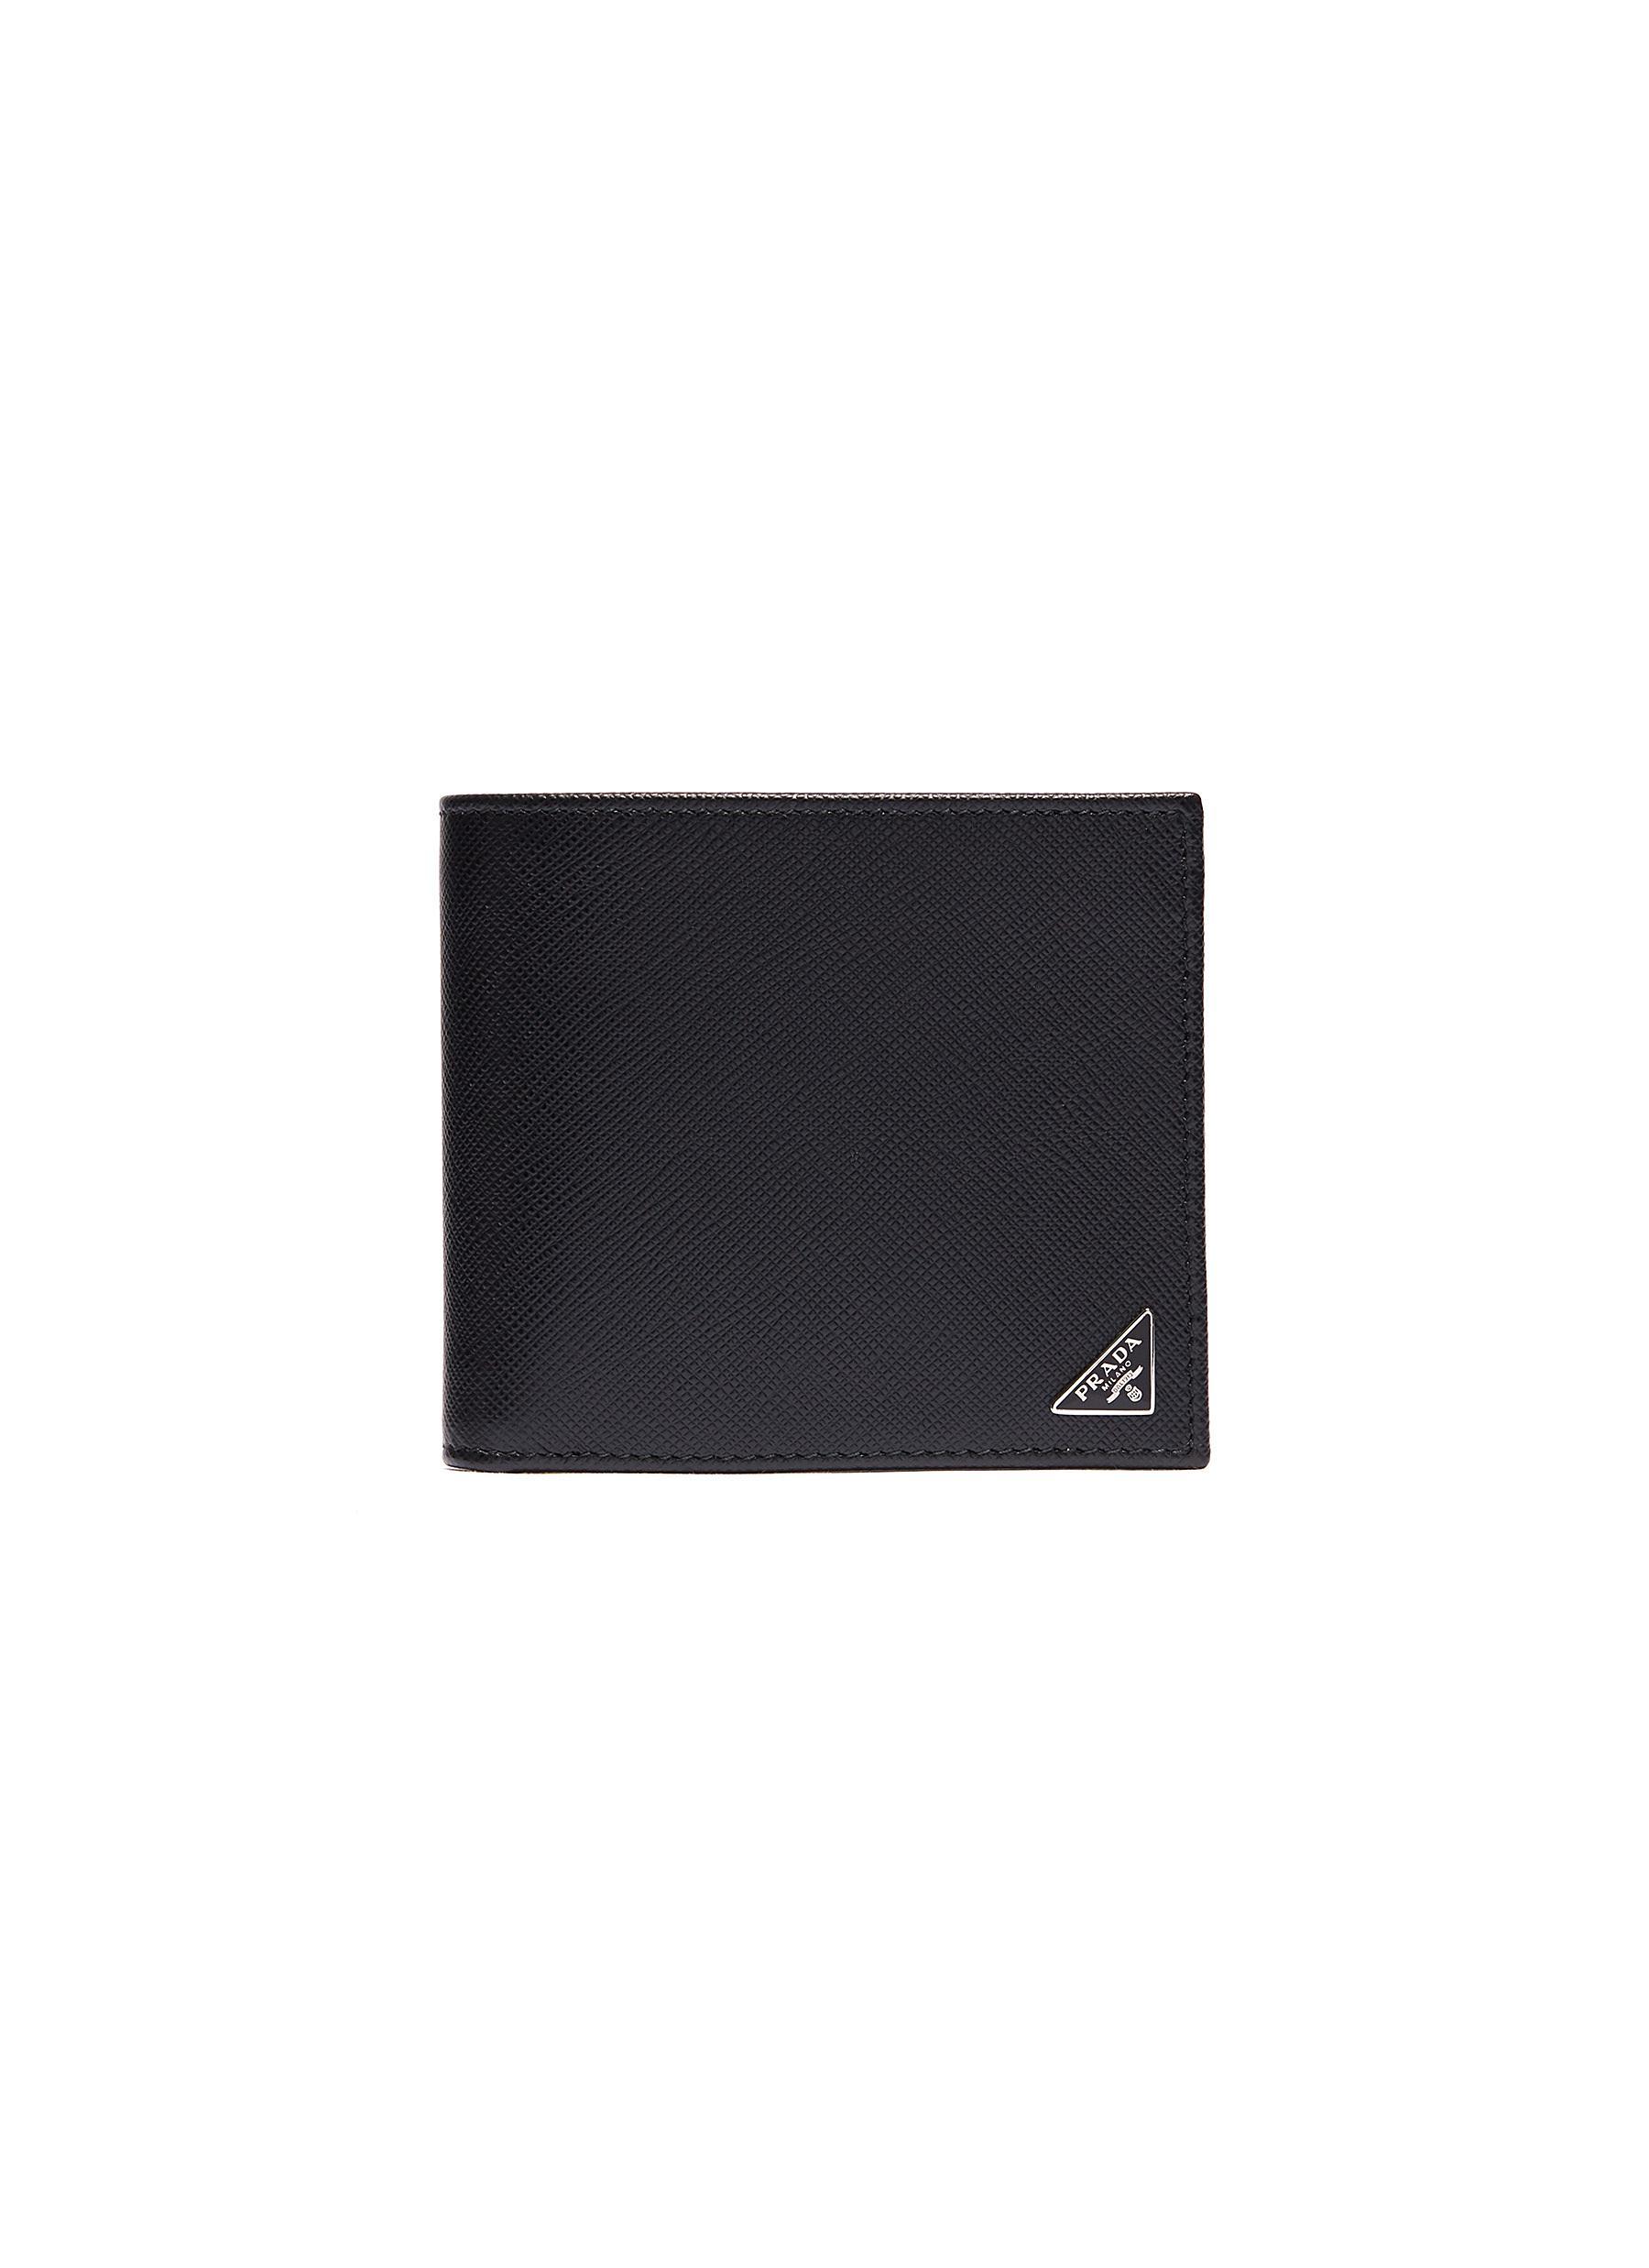 Prada Wallets Logo plate saffiano leather bifold wallet